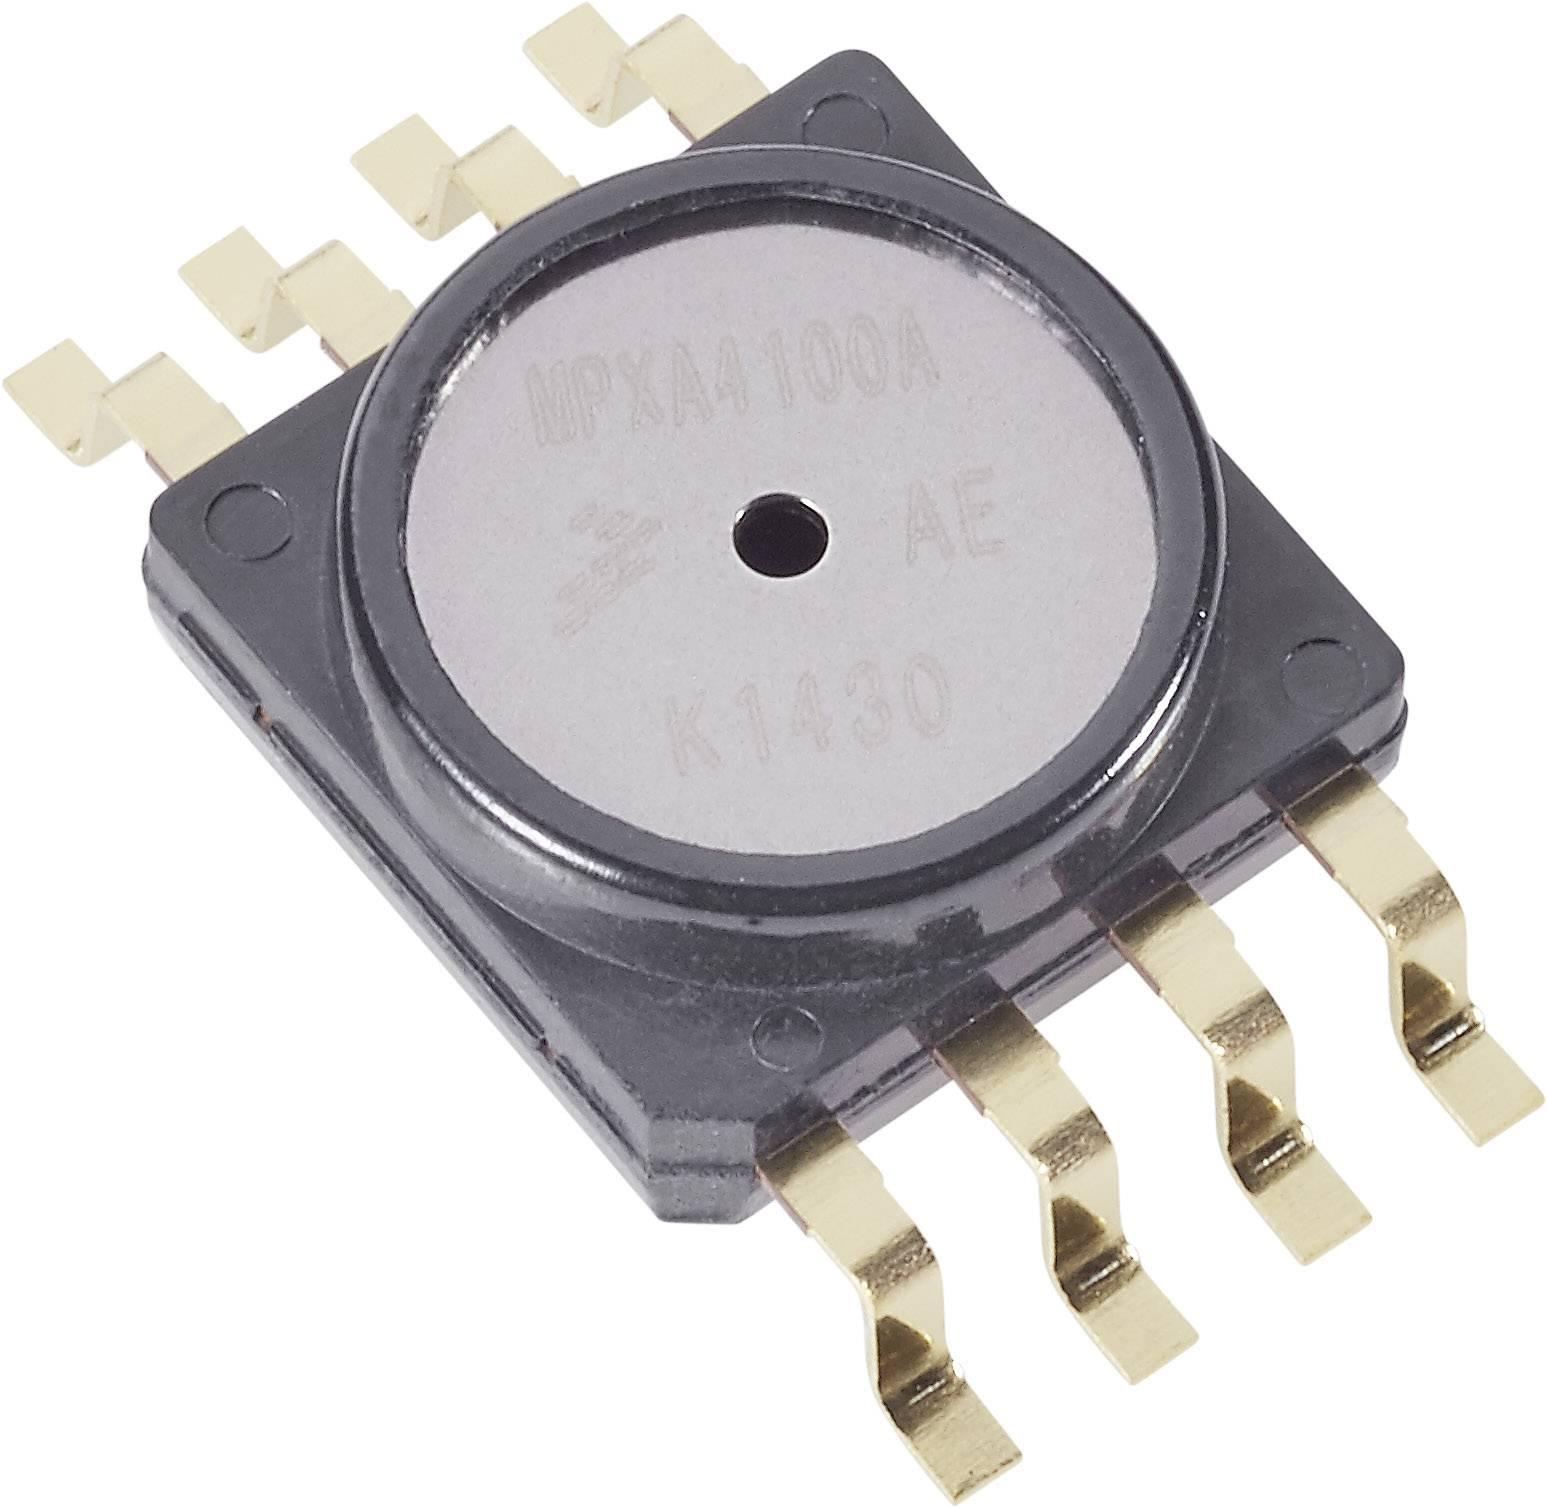 Senzor tlaku SMD MPXA4100A6U